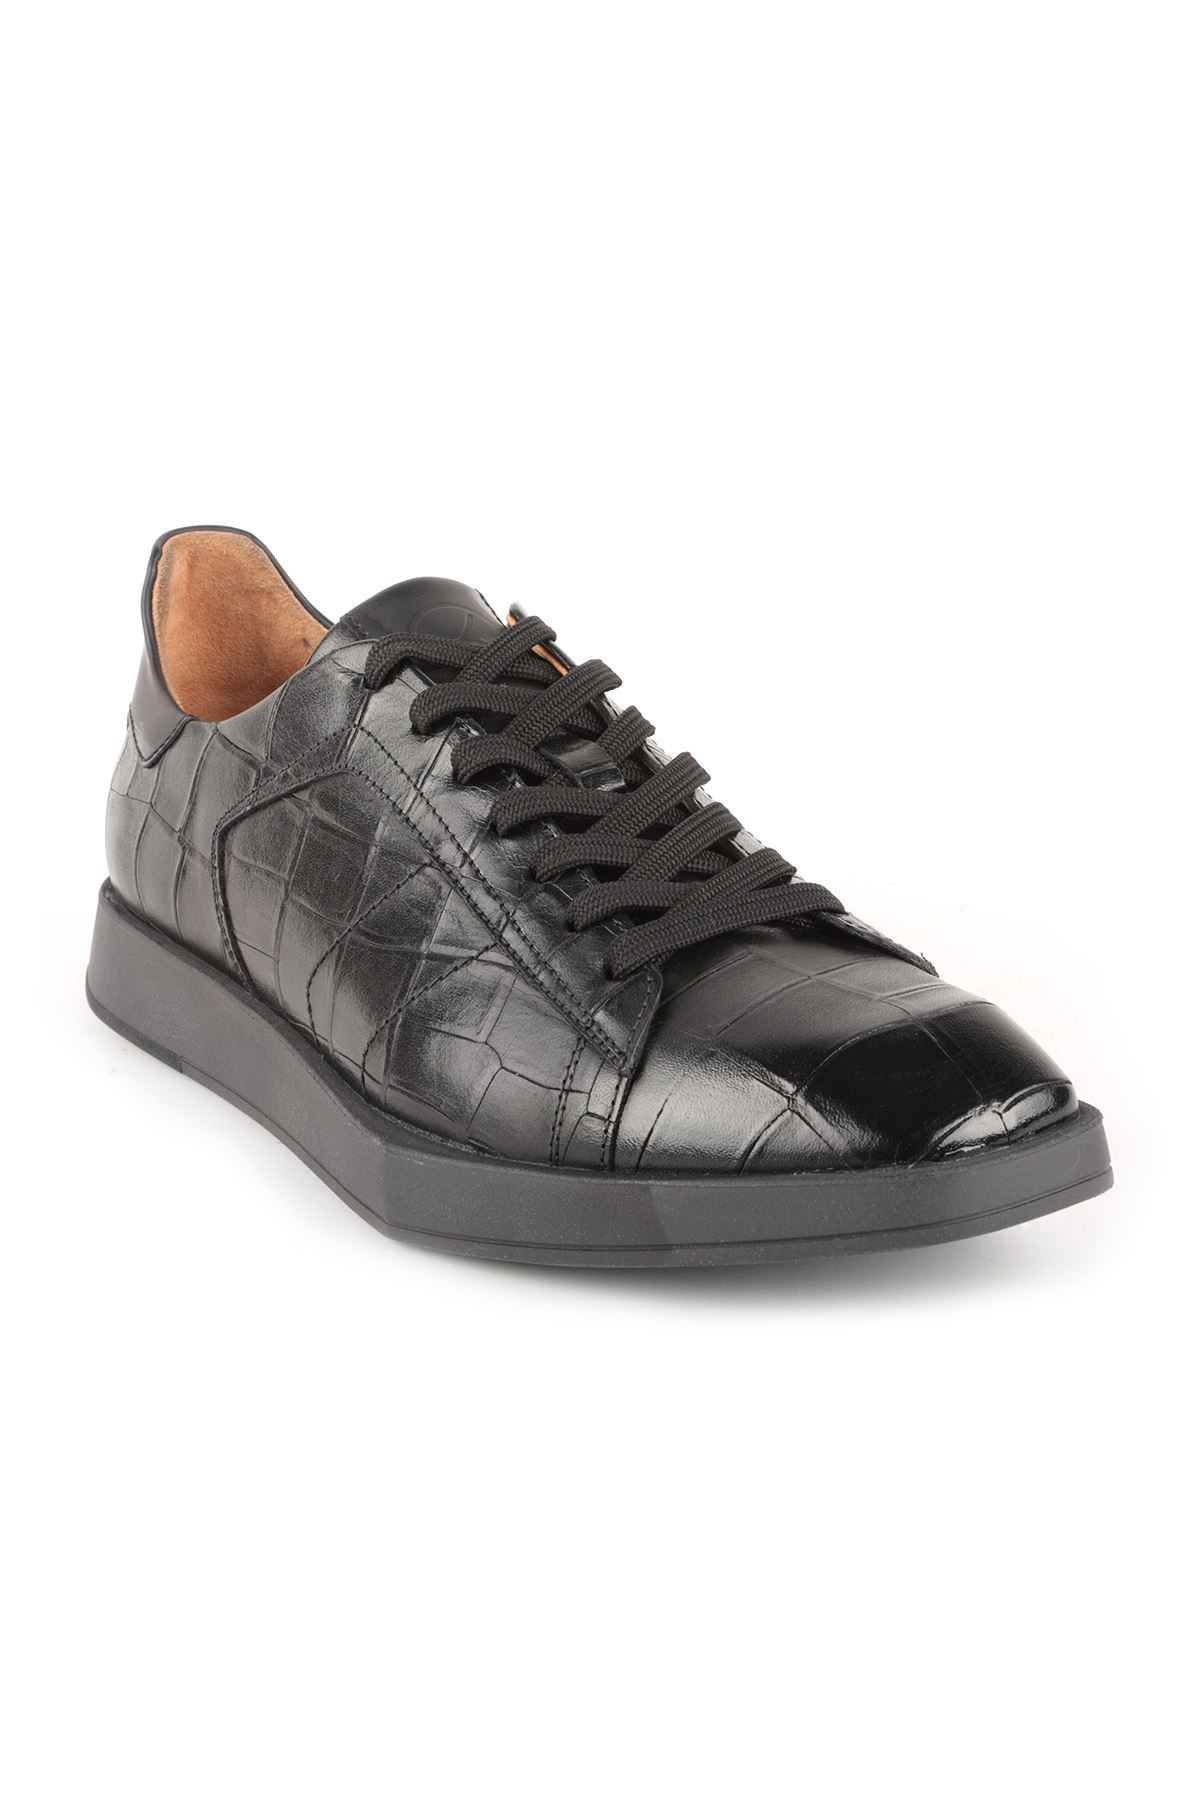 Libero L3805 Siyah Erkek Ayakkabı